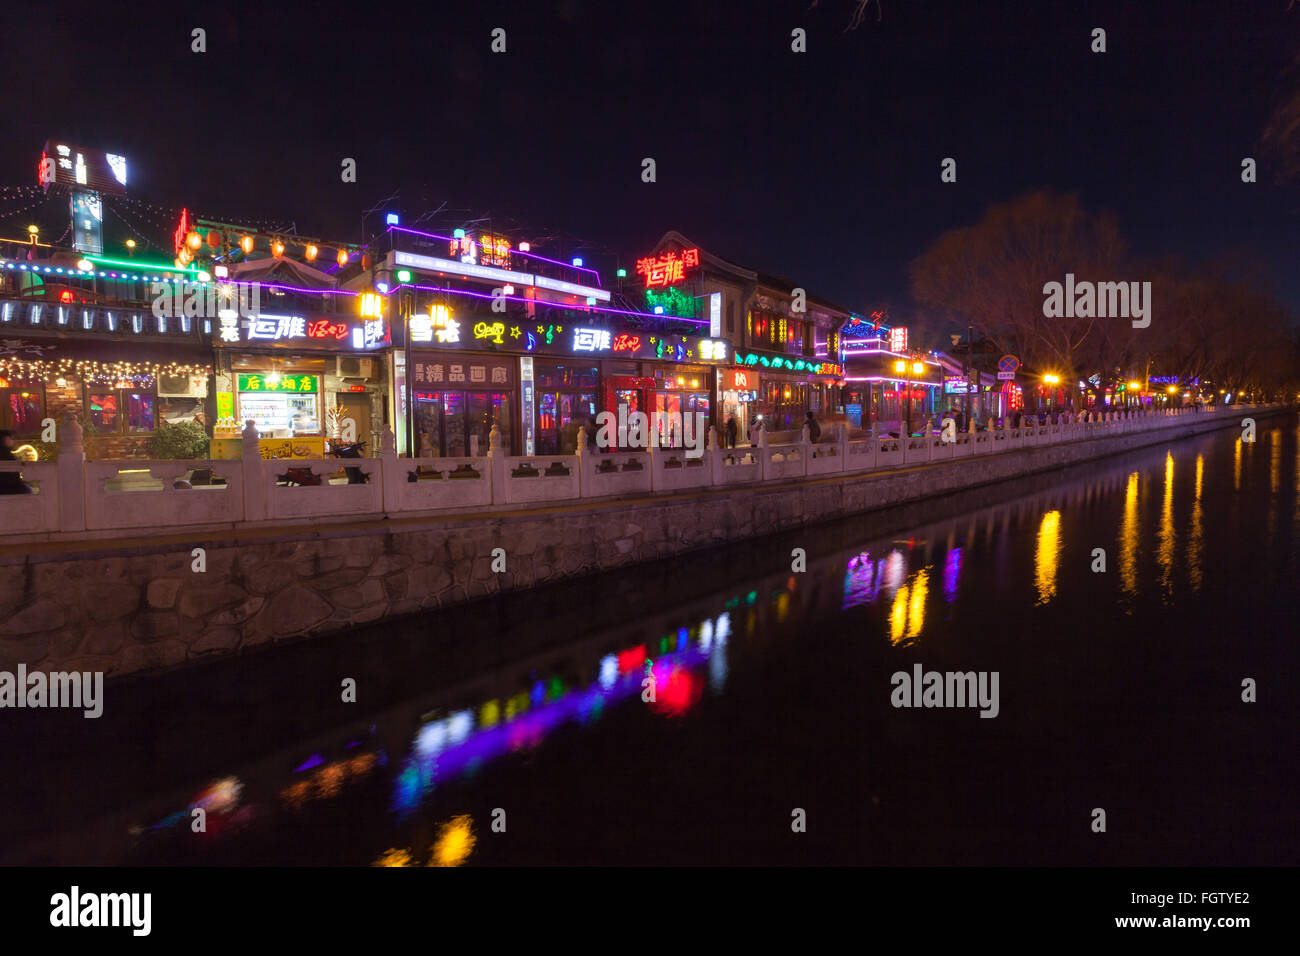 China Beijing Shichahai Houhai - Stock Image